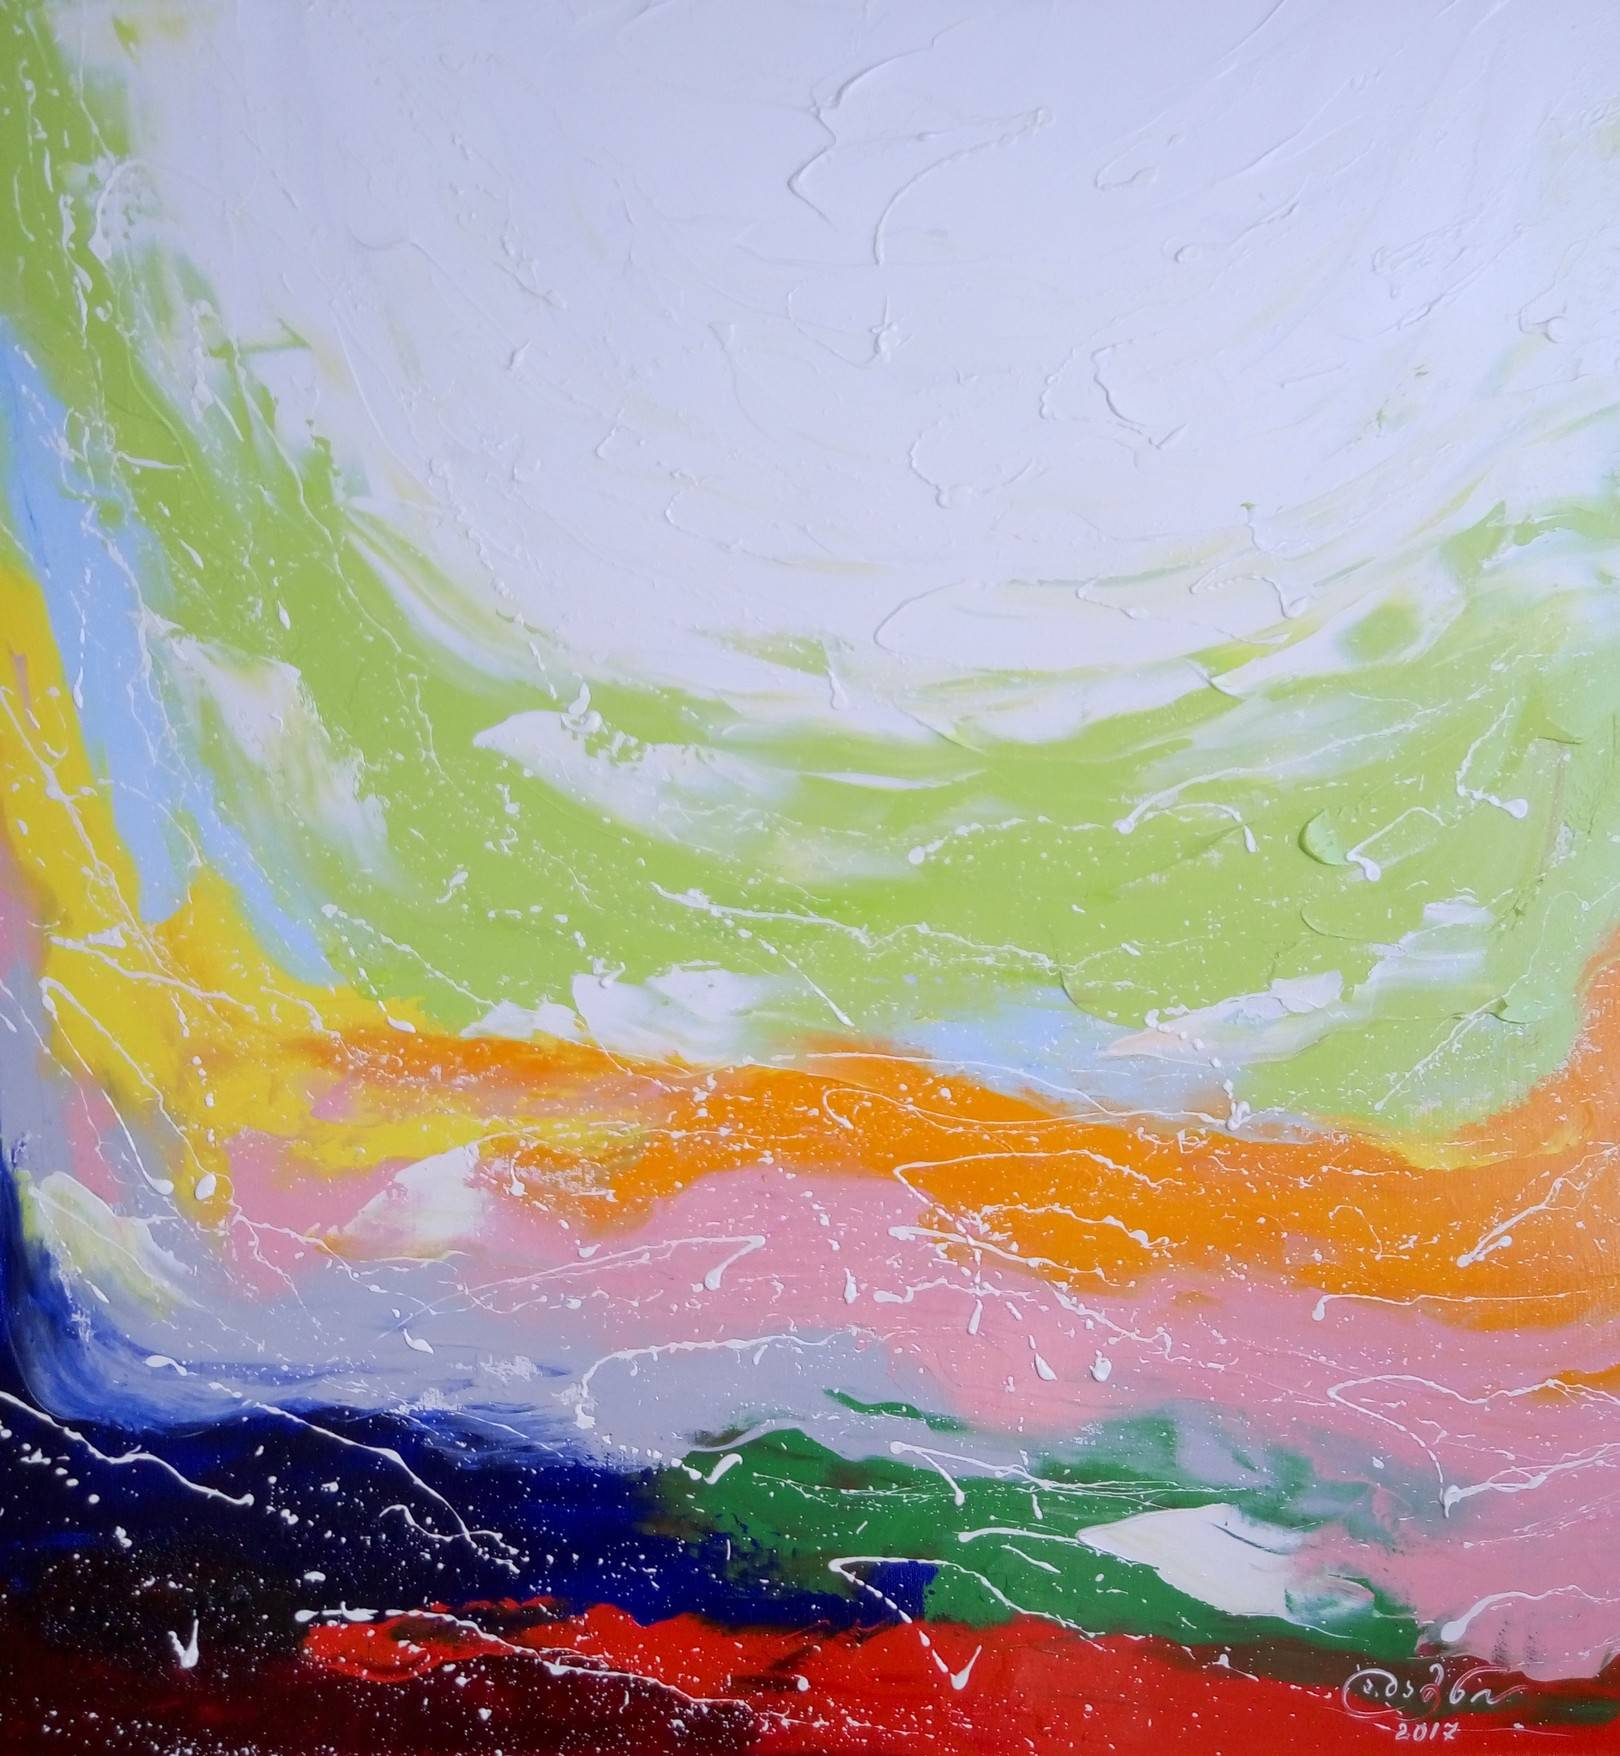 «Пейзаж»        холст, масло «Landscape»   oil on canvas 68x64, 2017